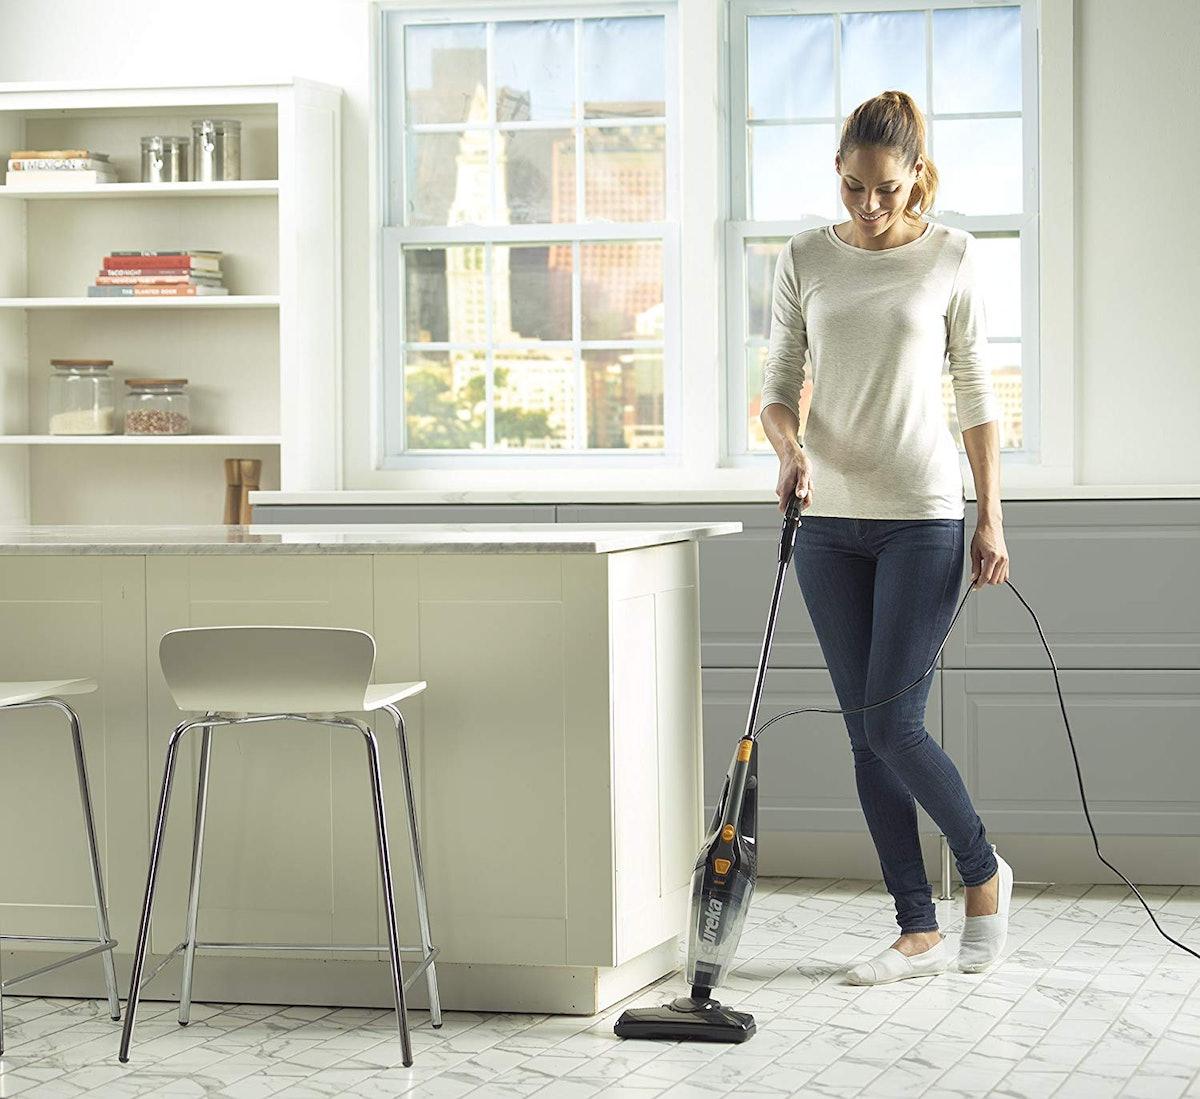 Eureka Blaze Three-In-One Vacuum